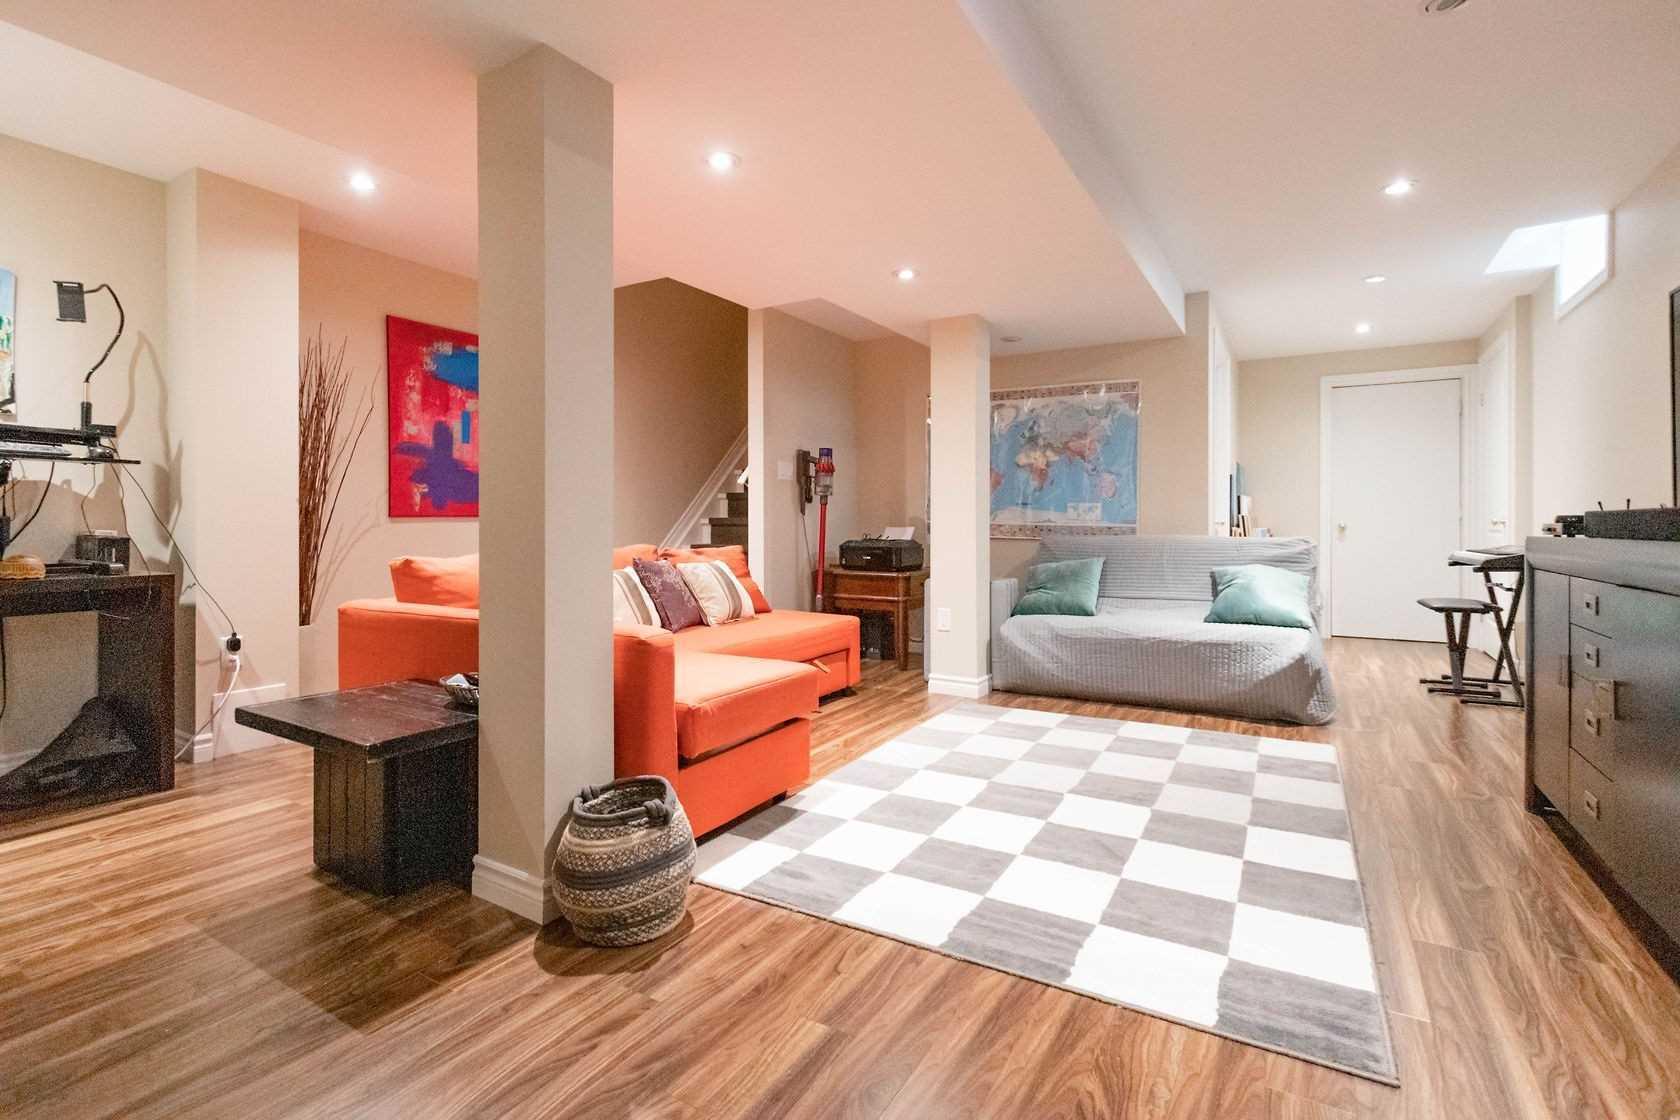 Semi-Detached For Sale In Oakville , 3 Bedrooms Bedrooms, ,3 BathroomsBathrooms,Semi-Detached,For Sale,Shorncliffe